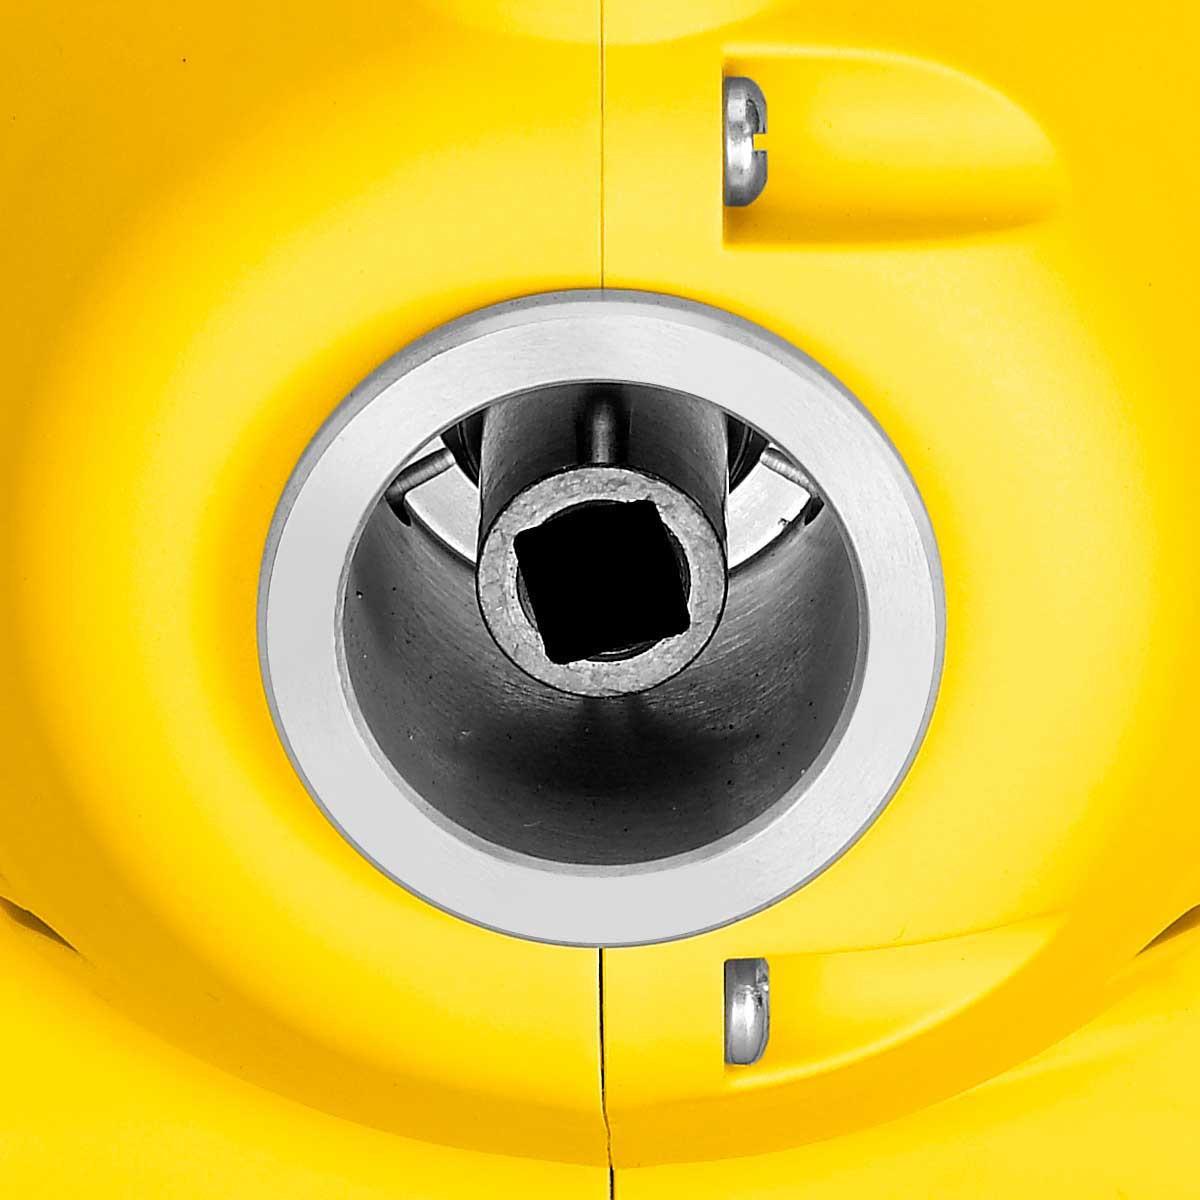 Wacker Neuson Vibrator form work